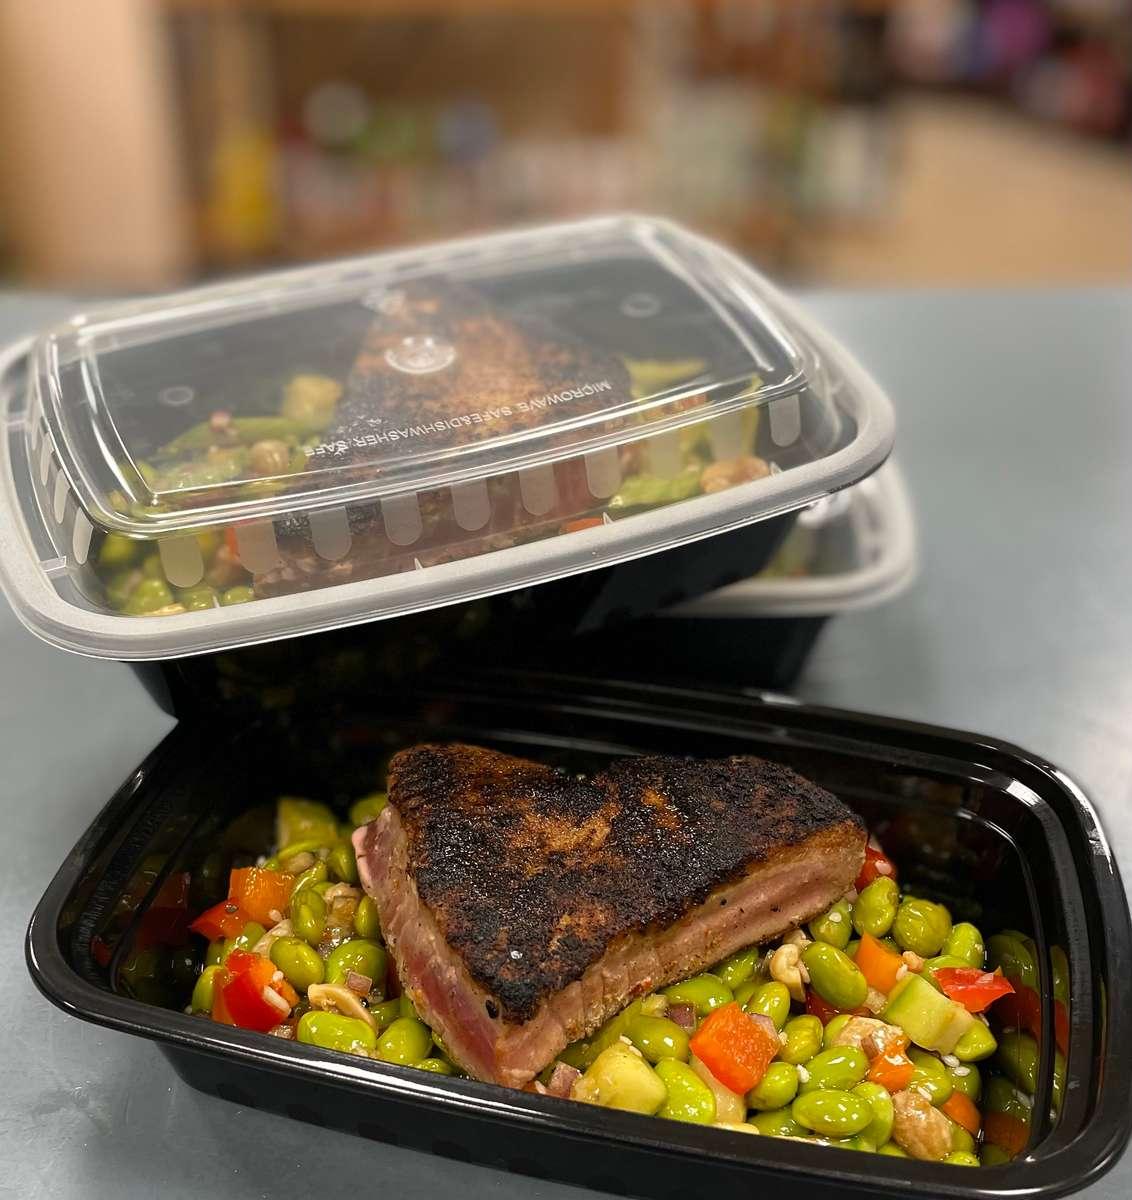 Seared Ahi Tune with Asian Edamame Salad (gf)